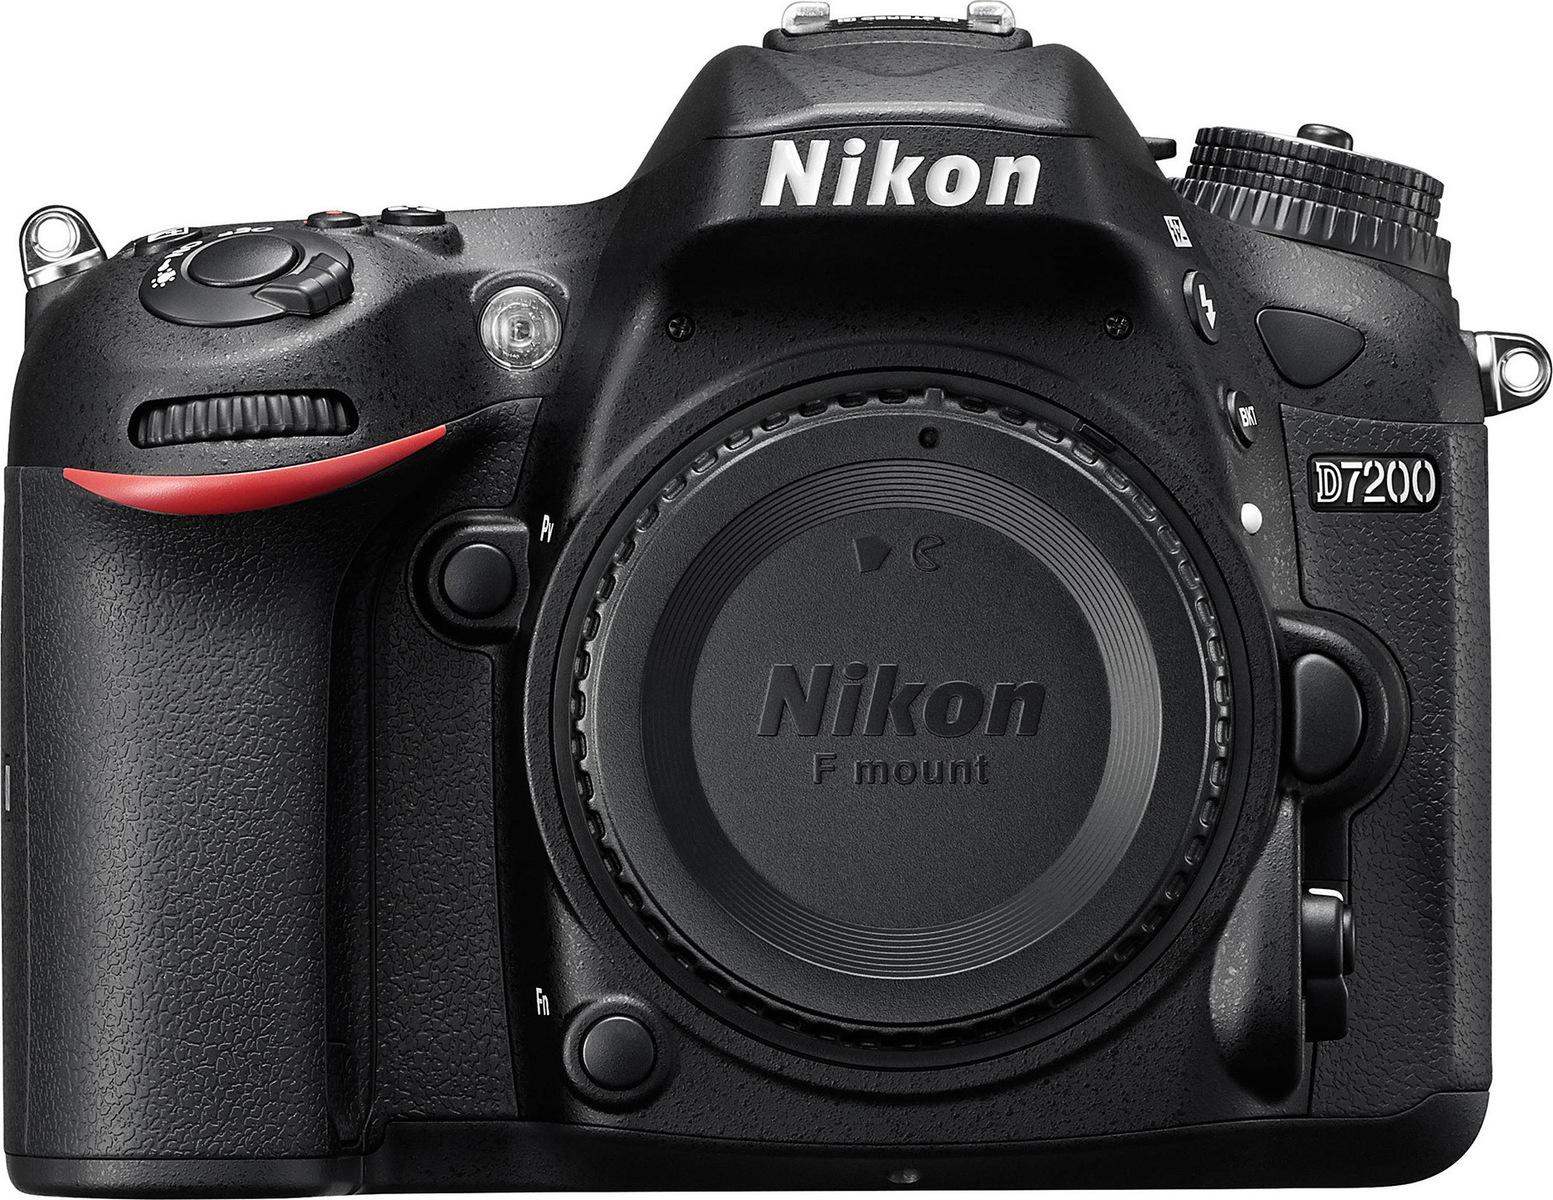 Nikon D7200 Body Πληρωμή έως 24 δόσεις